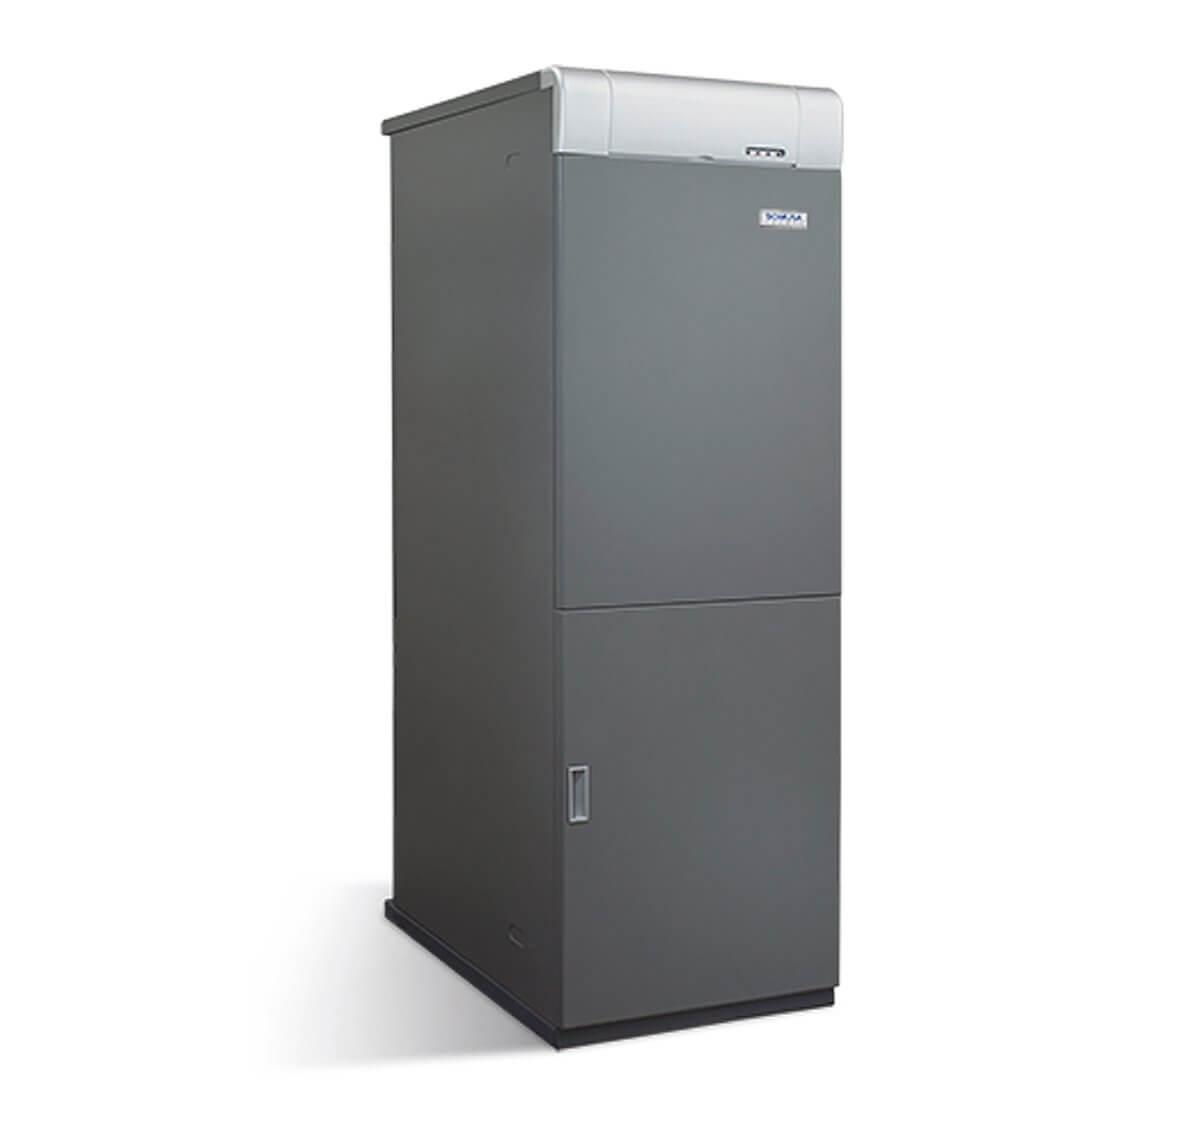 Caldera de Gasoil Domusa MCF 30 HDXE 100 LTS